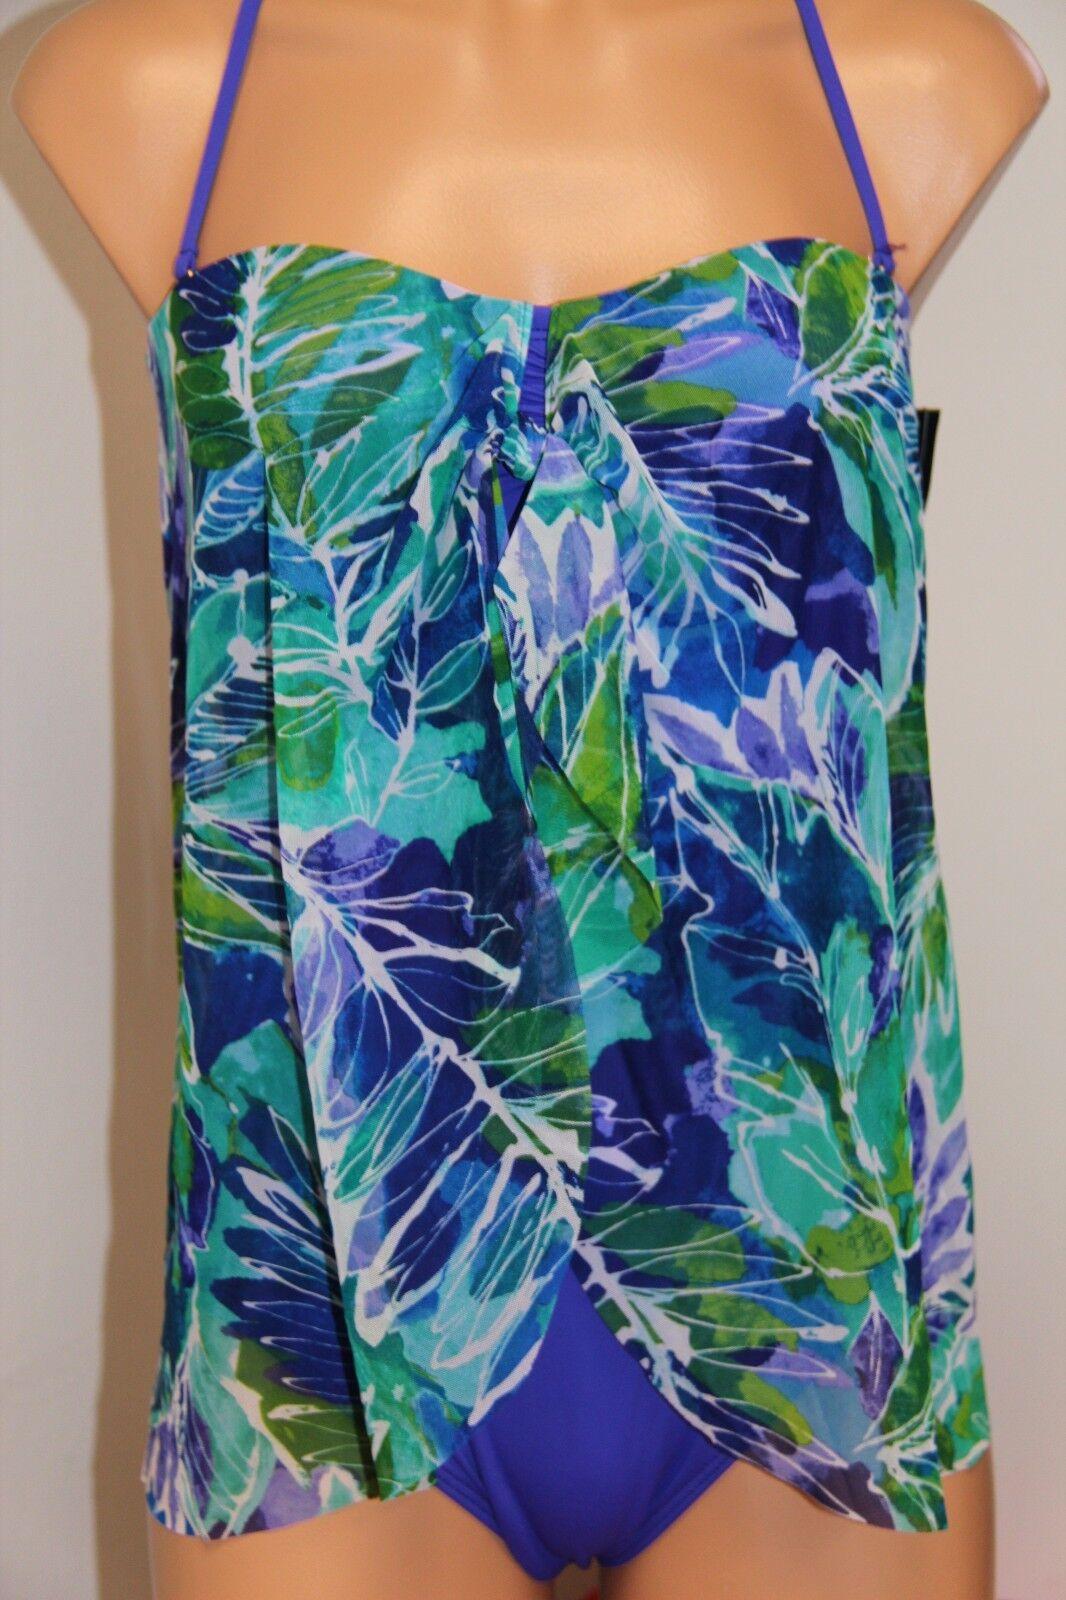 NWT Ralph Lauren Swimsuit Bikini 1 One piece Size 6 Fly Away bluee